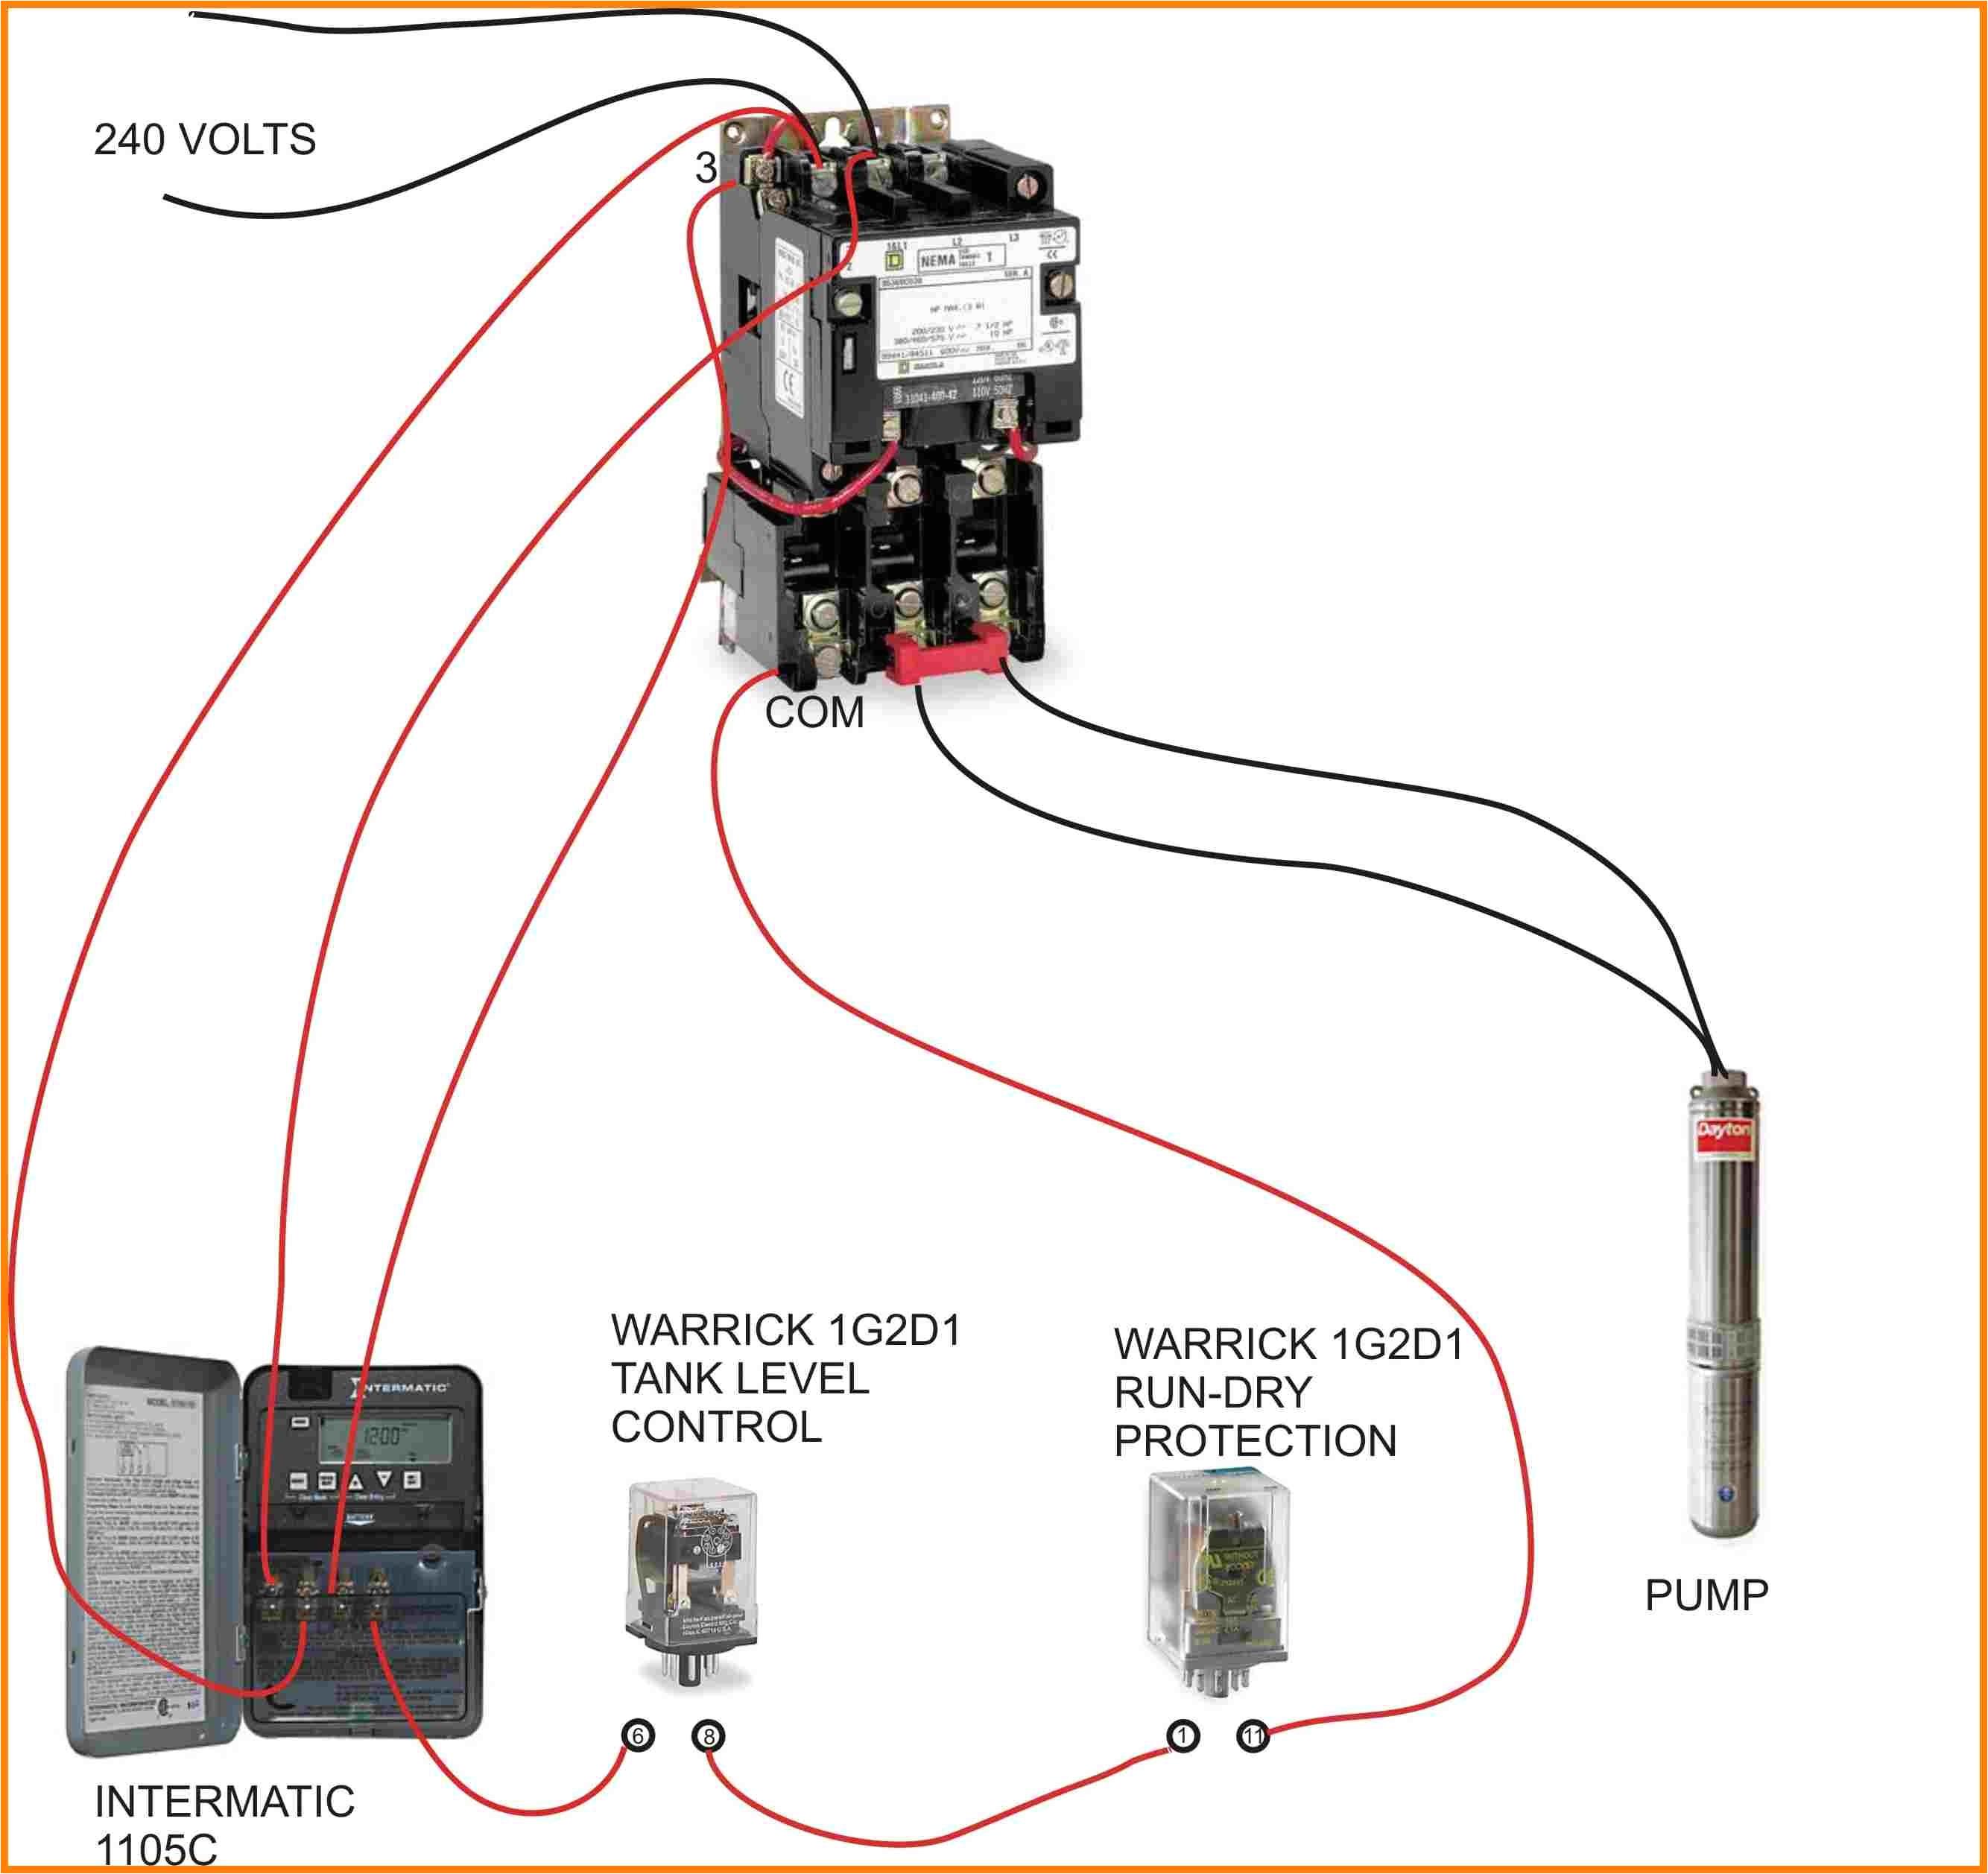 ac contactor wiring wiring diagram post split ac contactor wiring diagram ac contactor wiring